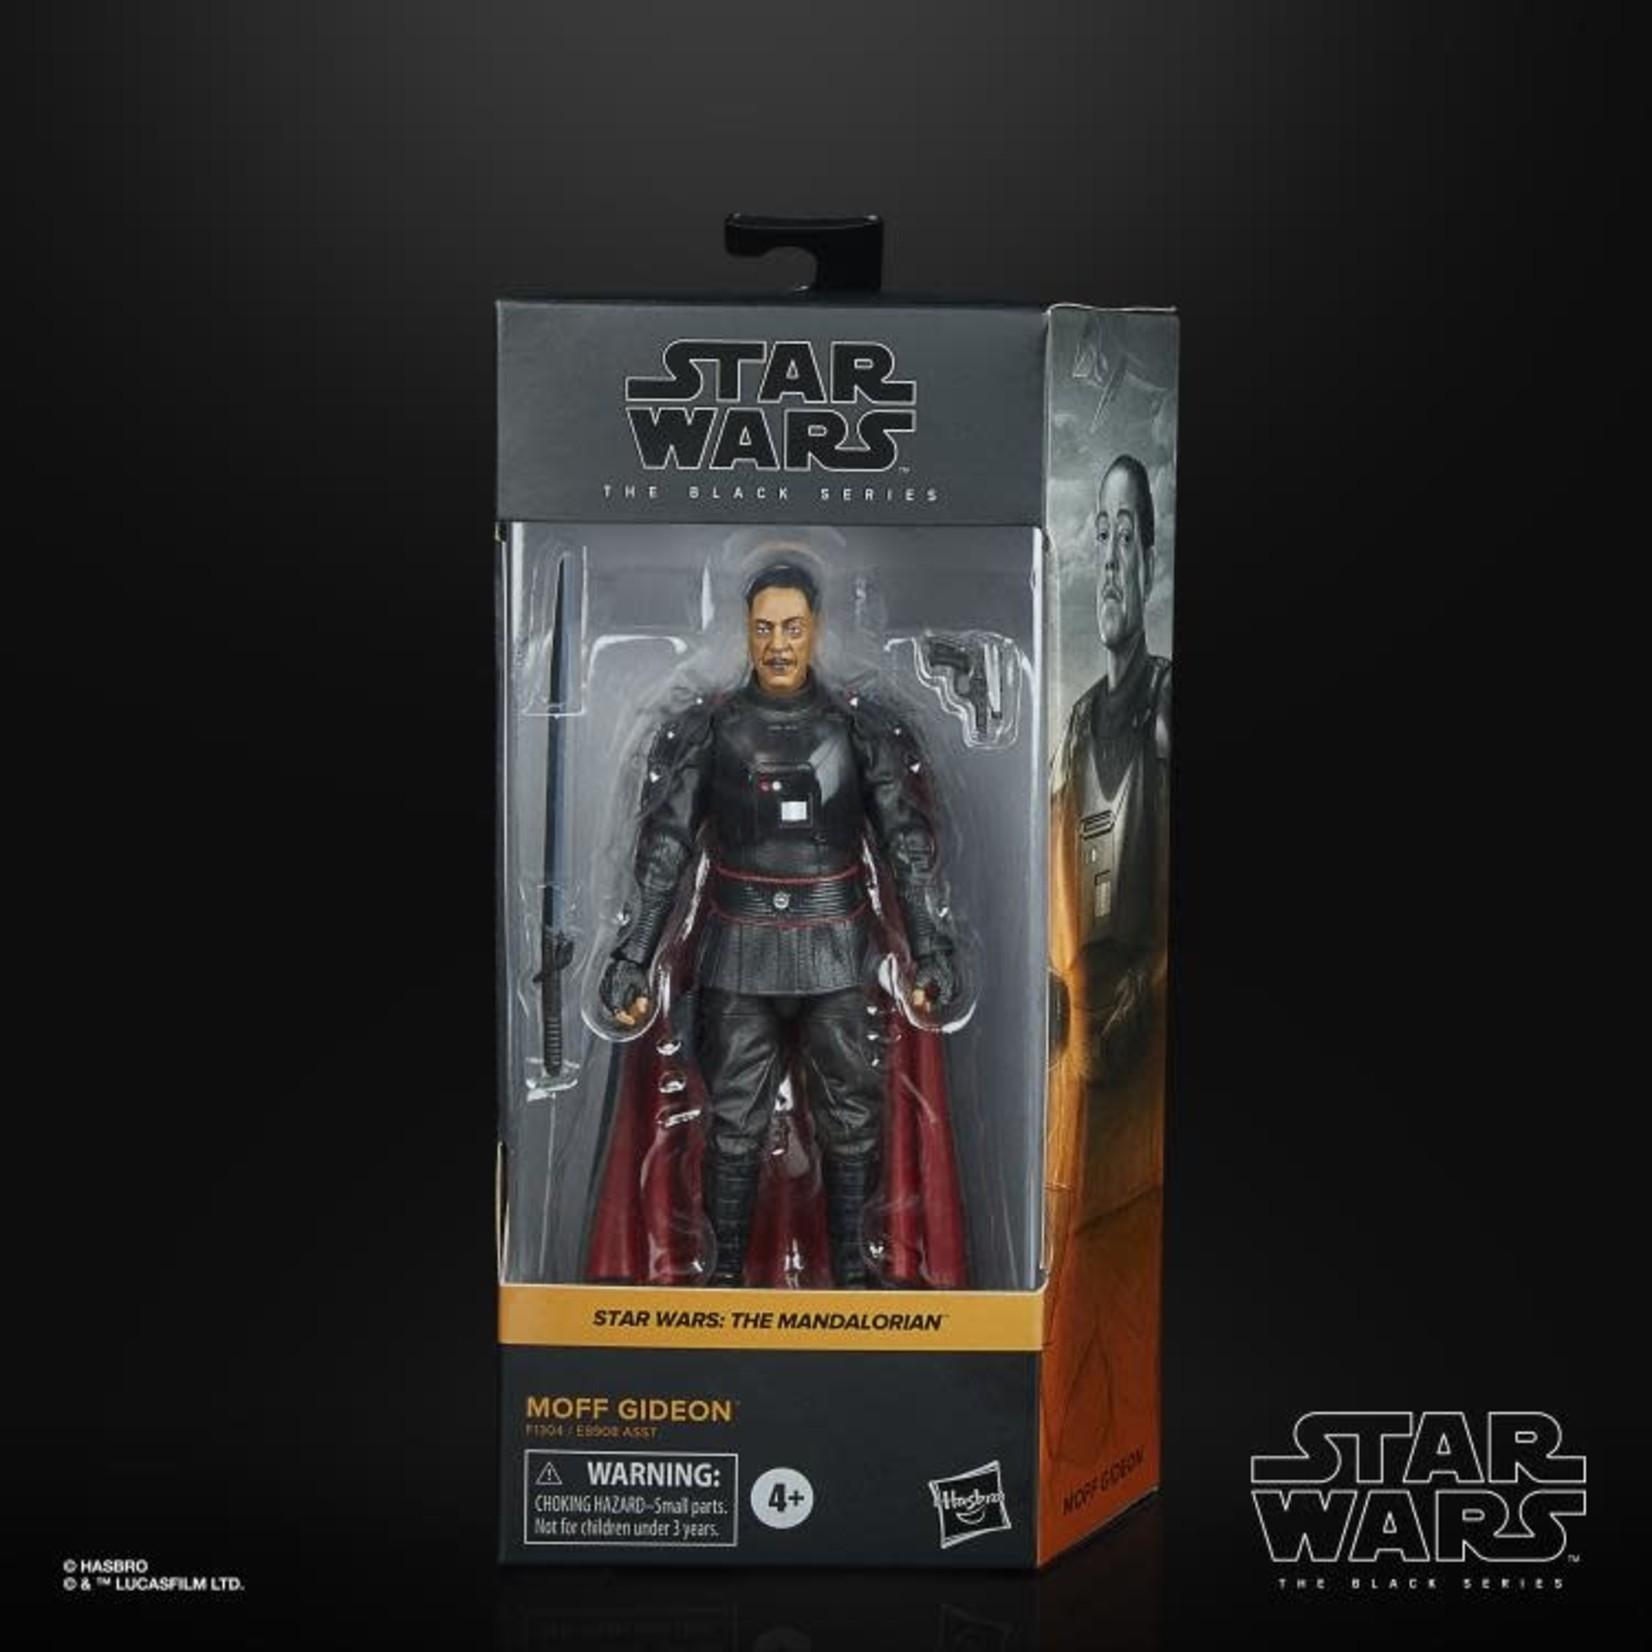 Hasbro Star Wars The Black Series - Moff Gideon